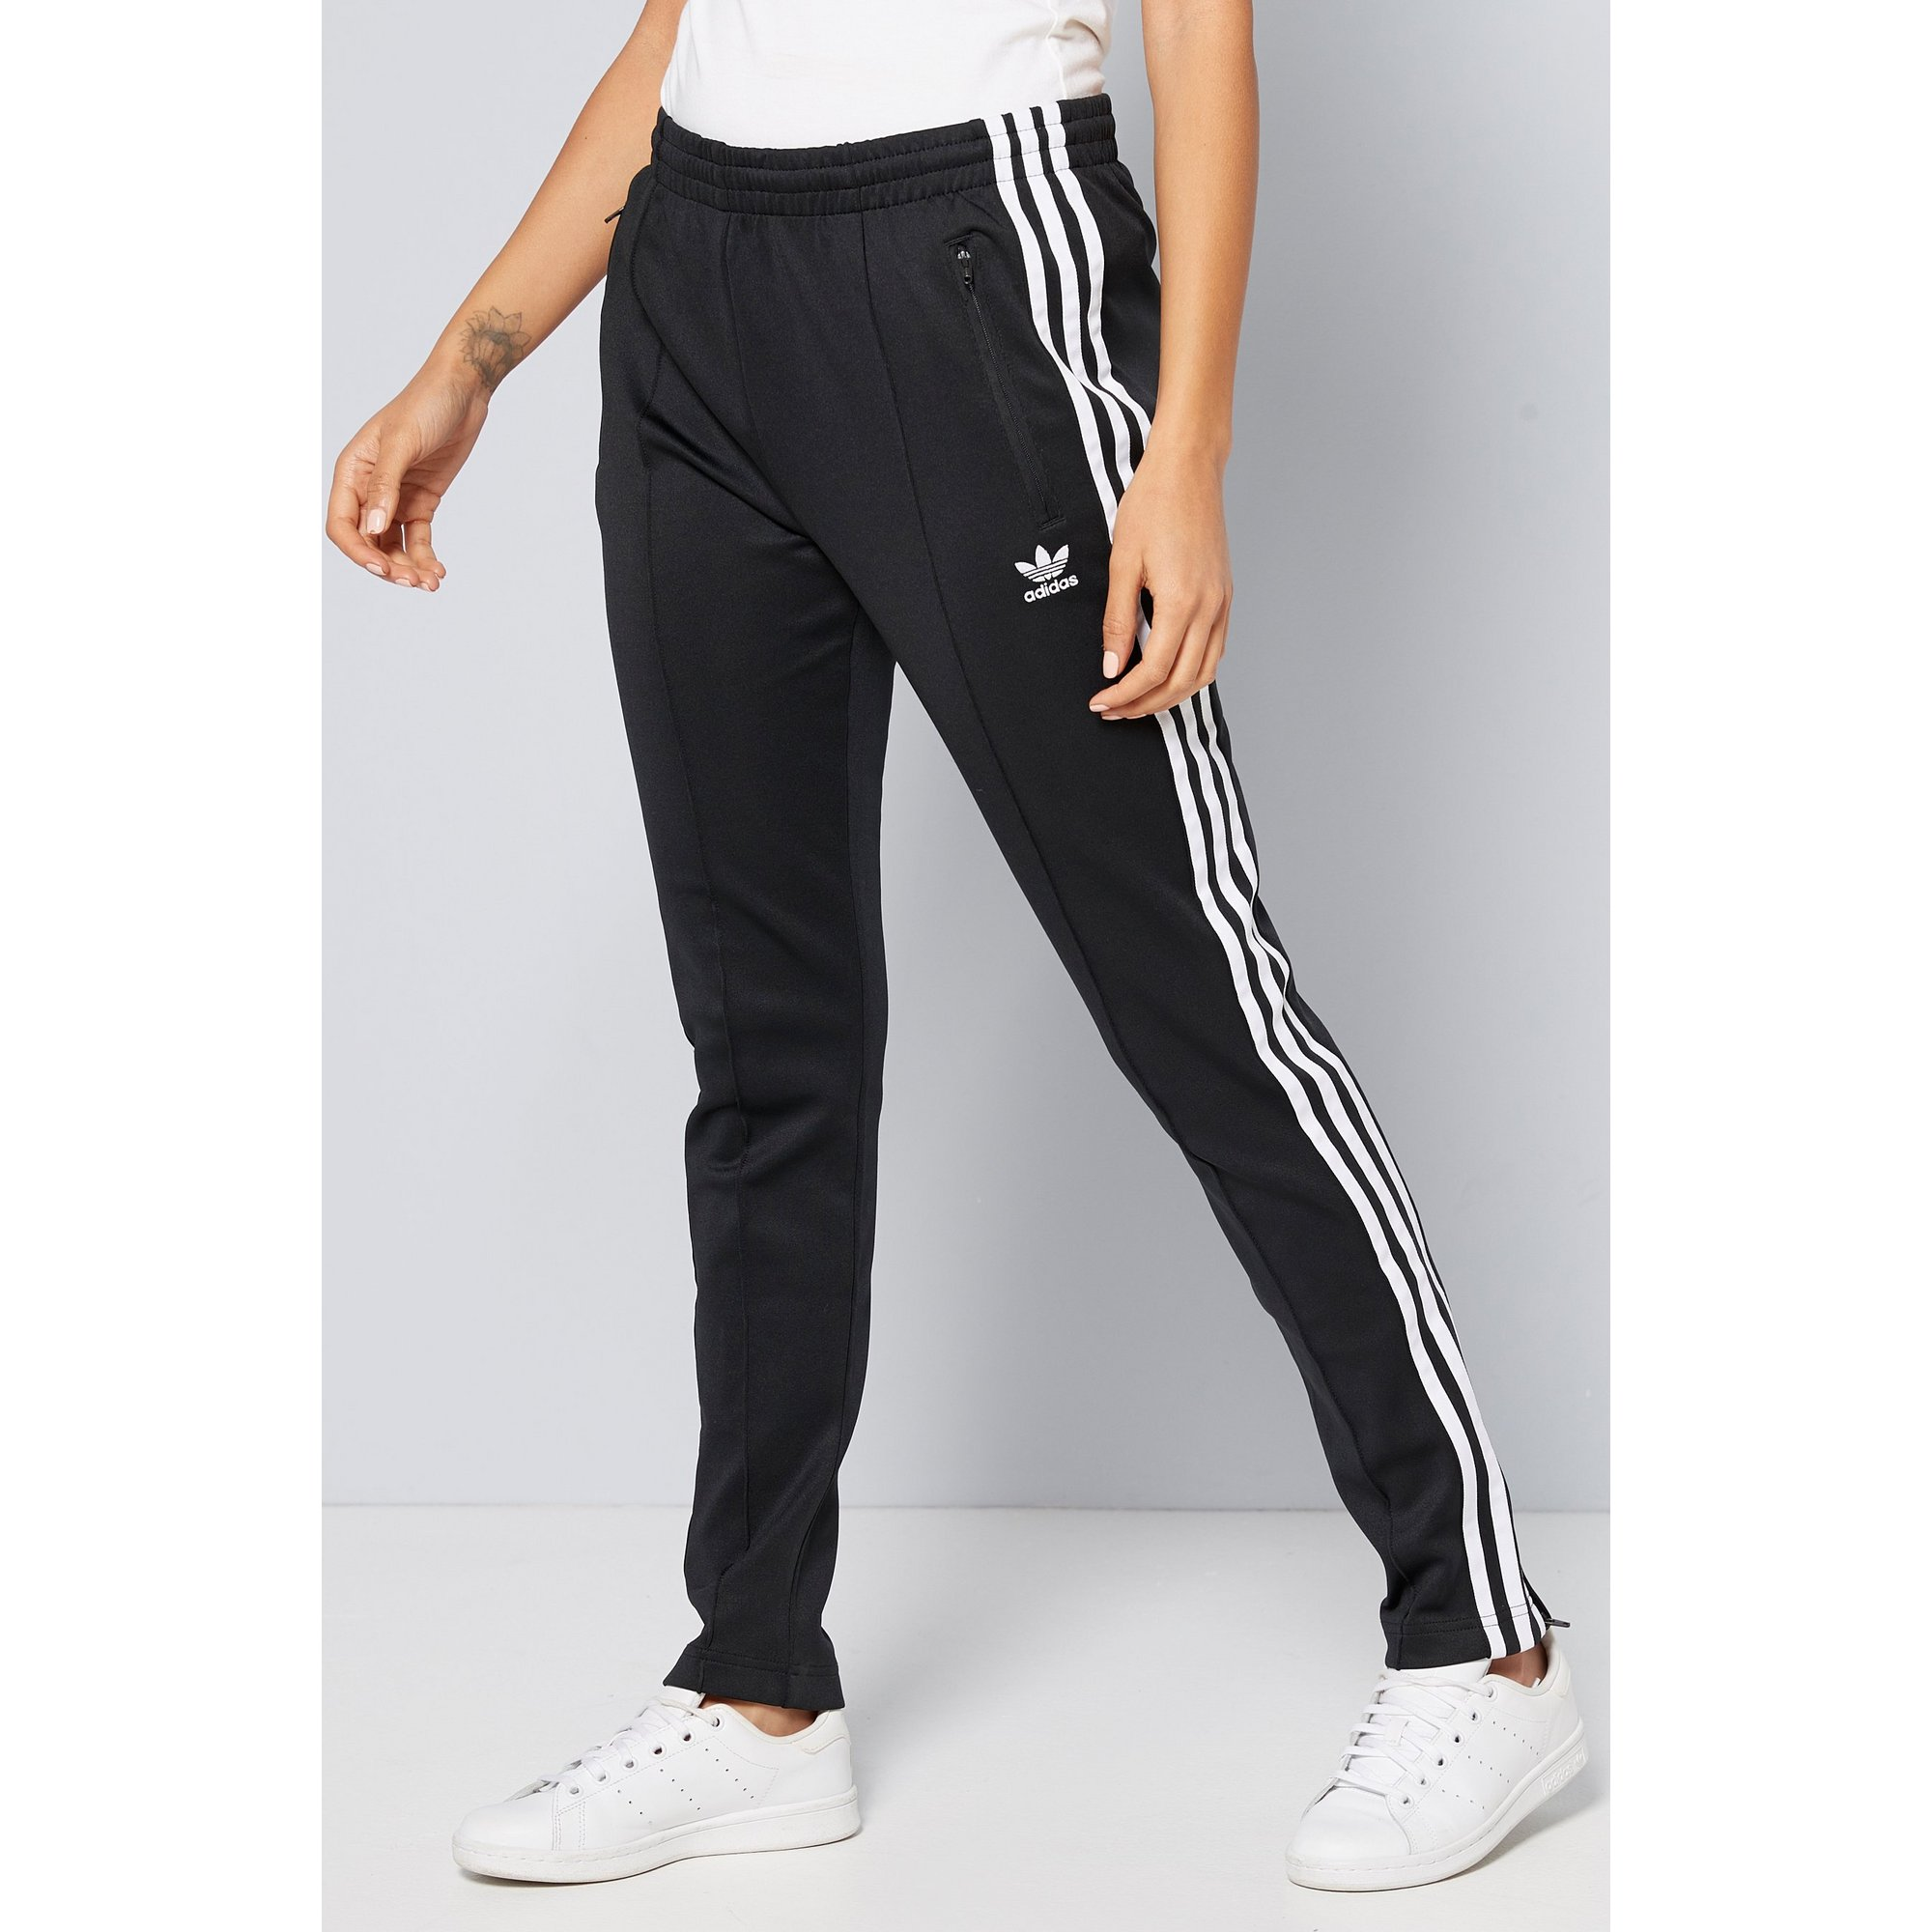 Image of adidas Originals SST Black Track Pants